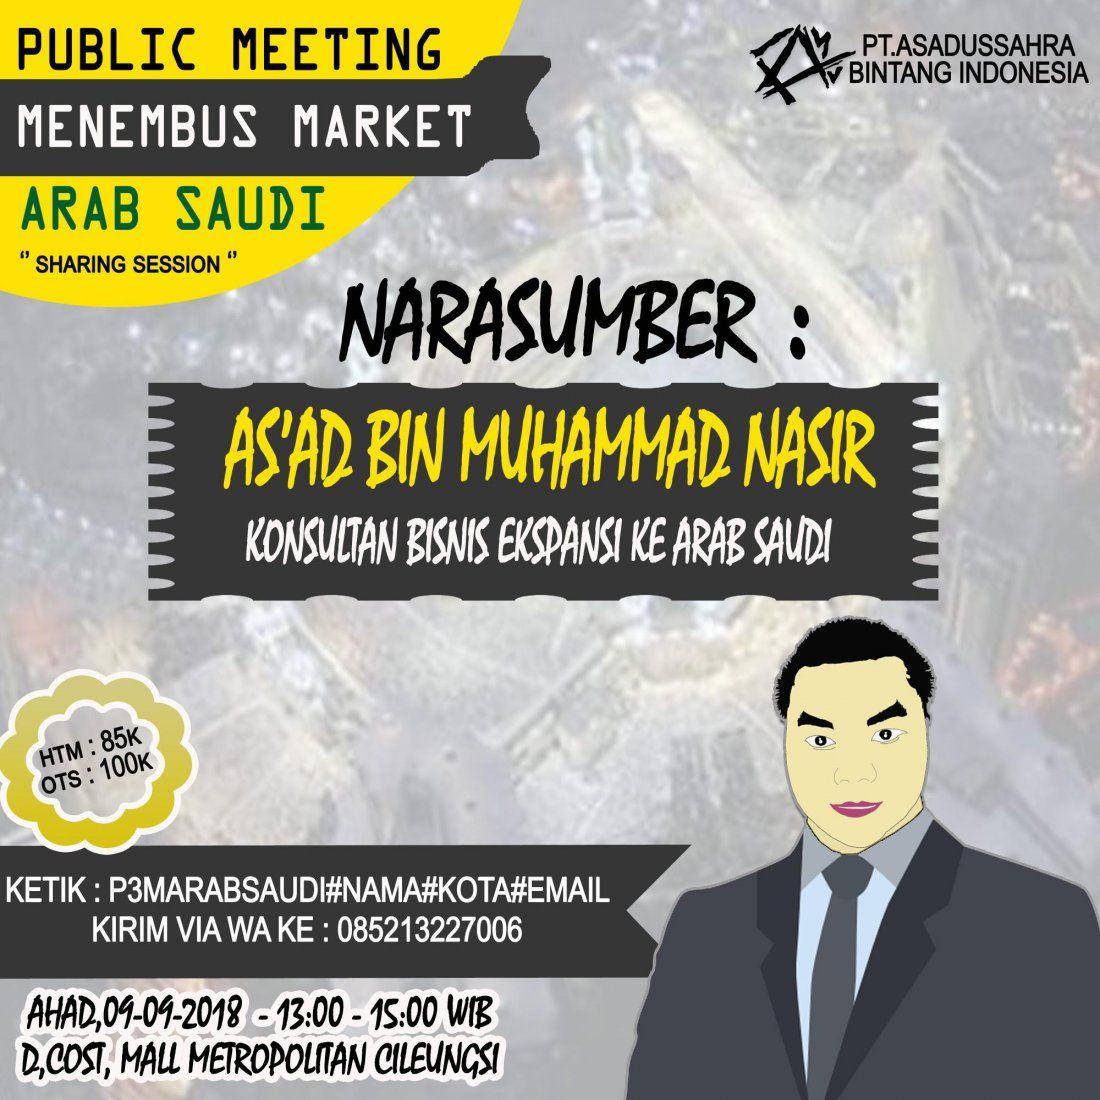 Public Meeting ( Sharing Session )   Menembus Market Arab Saudi